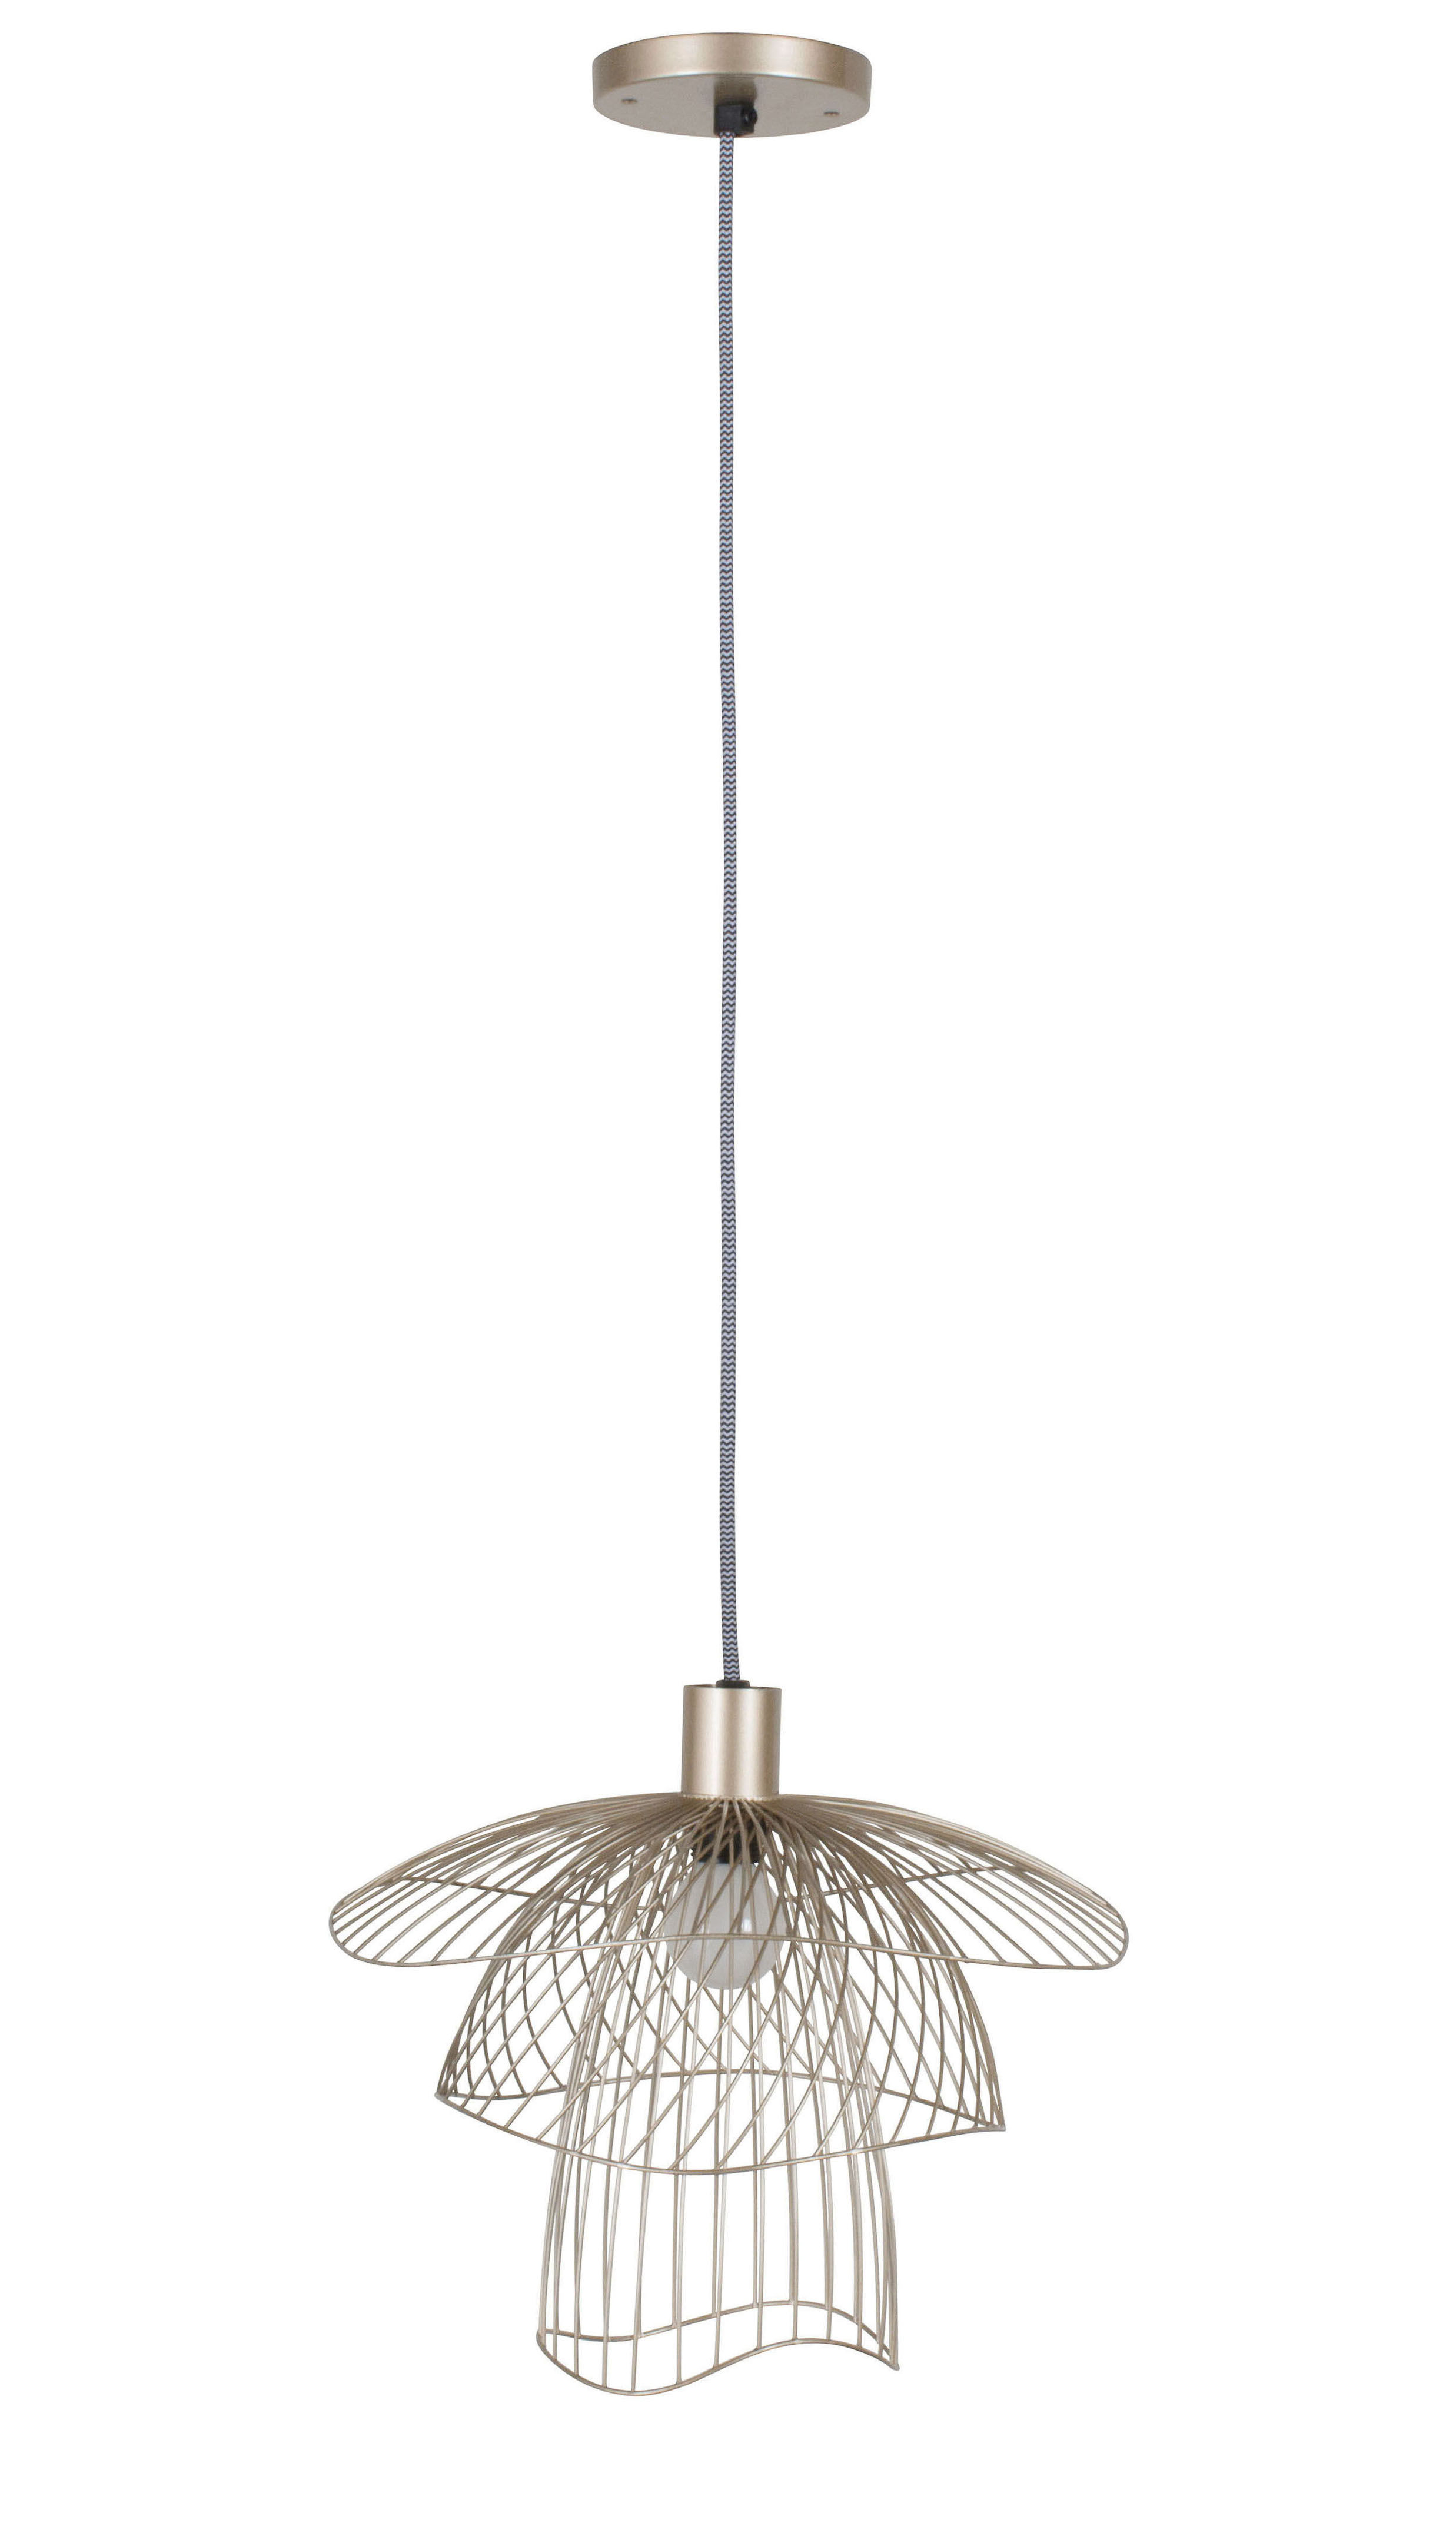 suspension papillon xs 30 cm champagne forestier. Black Bedroom Furniture Sets. Home Design Ideas